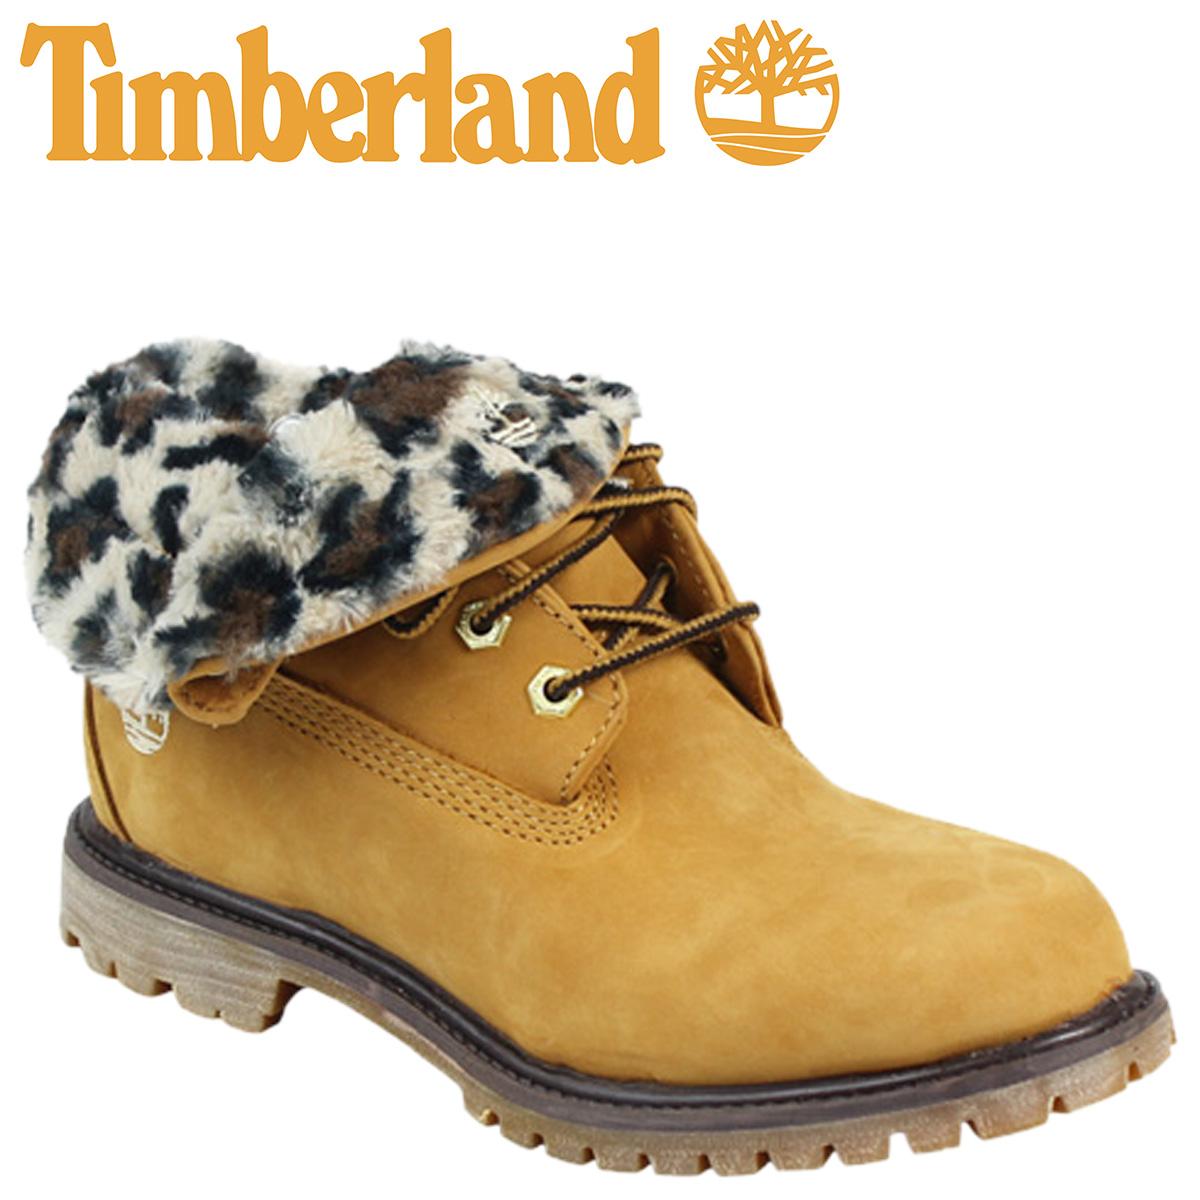 [SOLD OUT]timbarando Timberland女士WOMEN'S EK AUTH RT CHEETAH長筒靴地線守門員確實的角色頂罩21694 W懷斯惠特